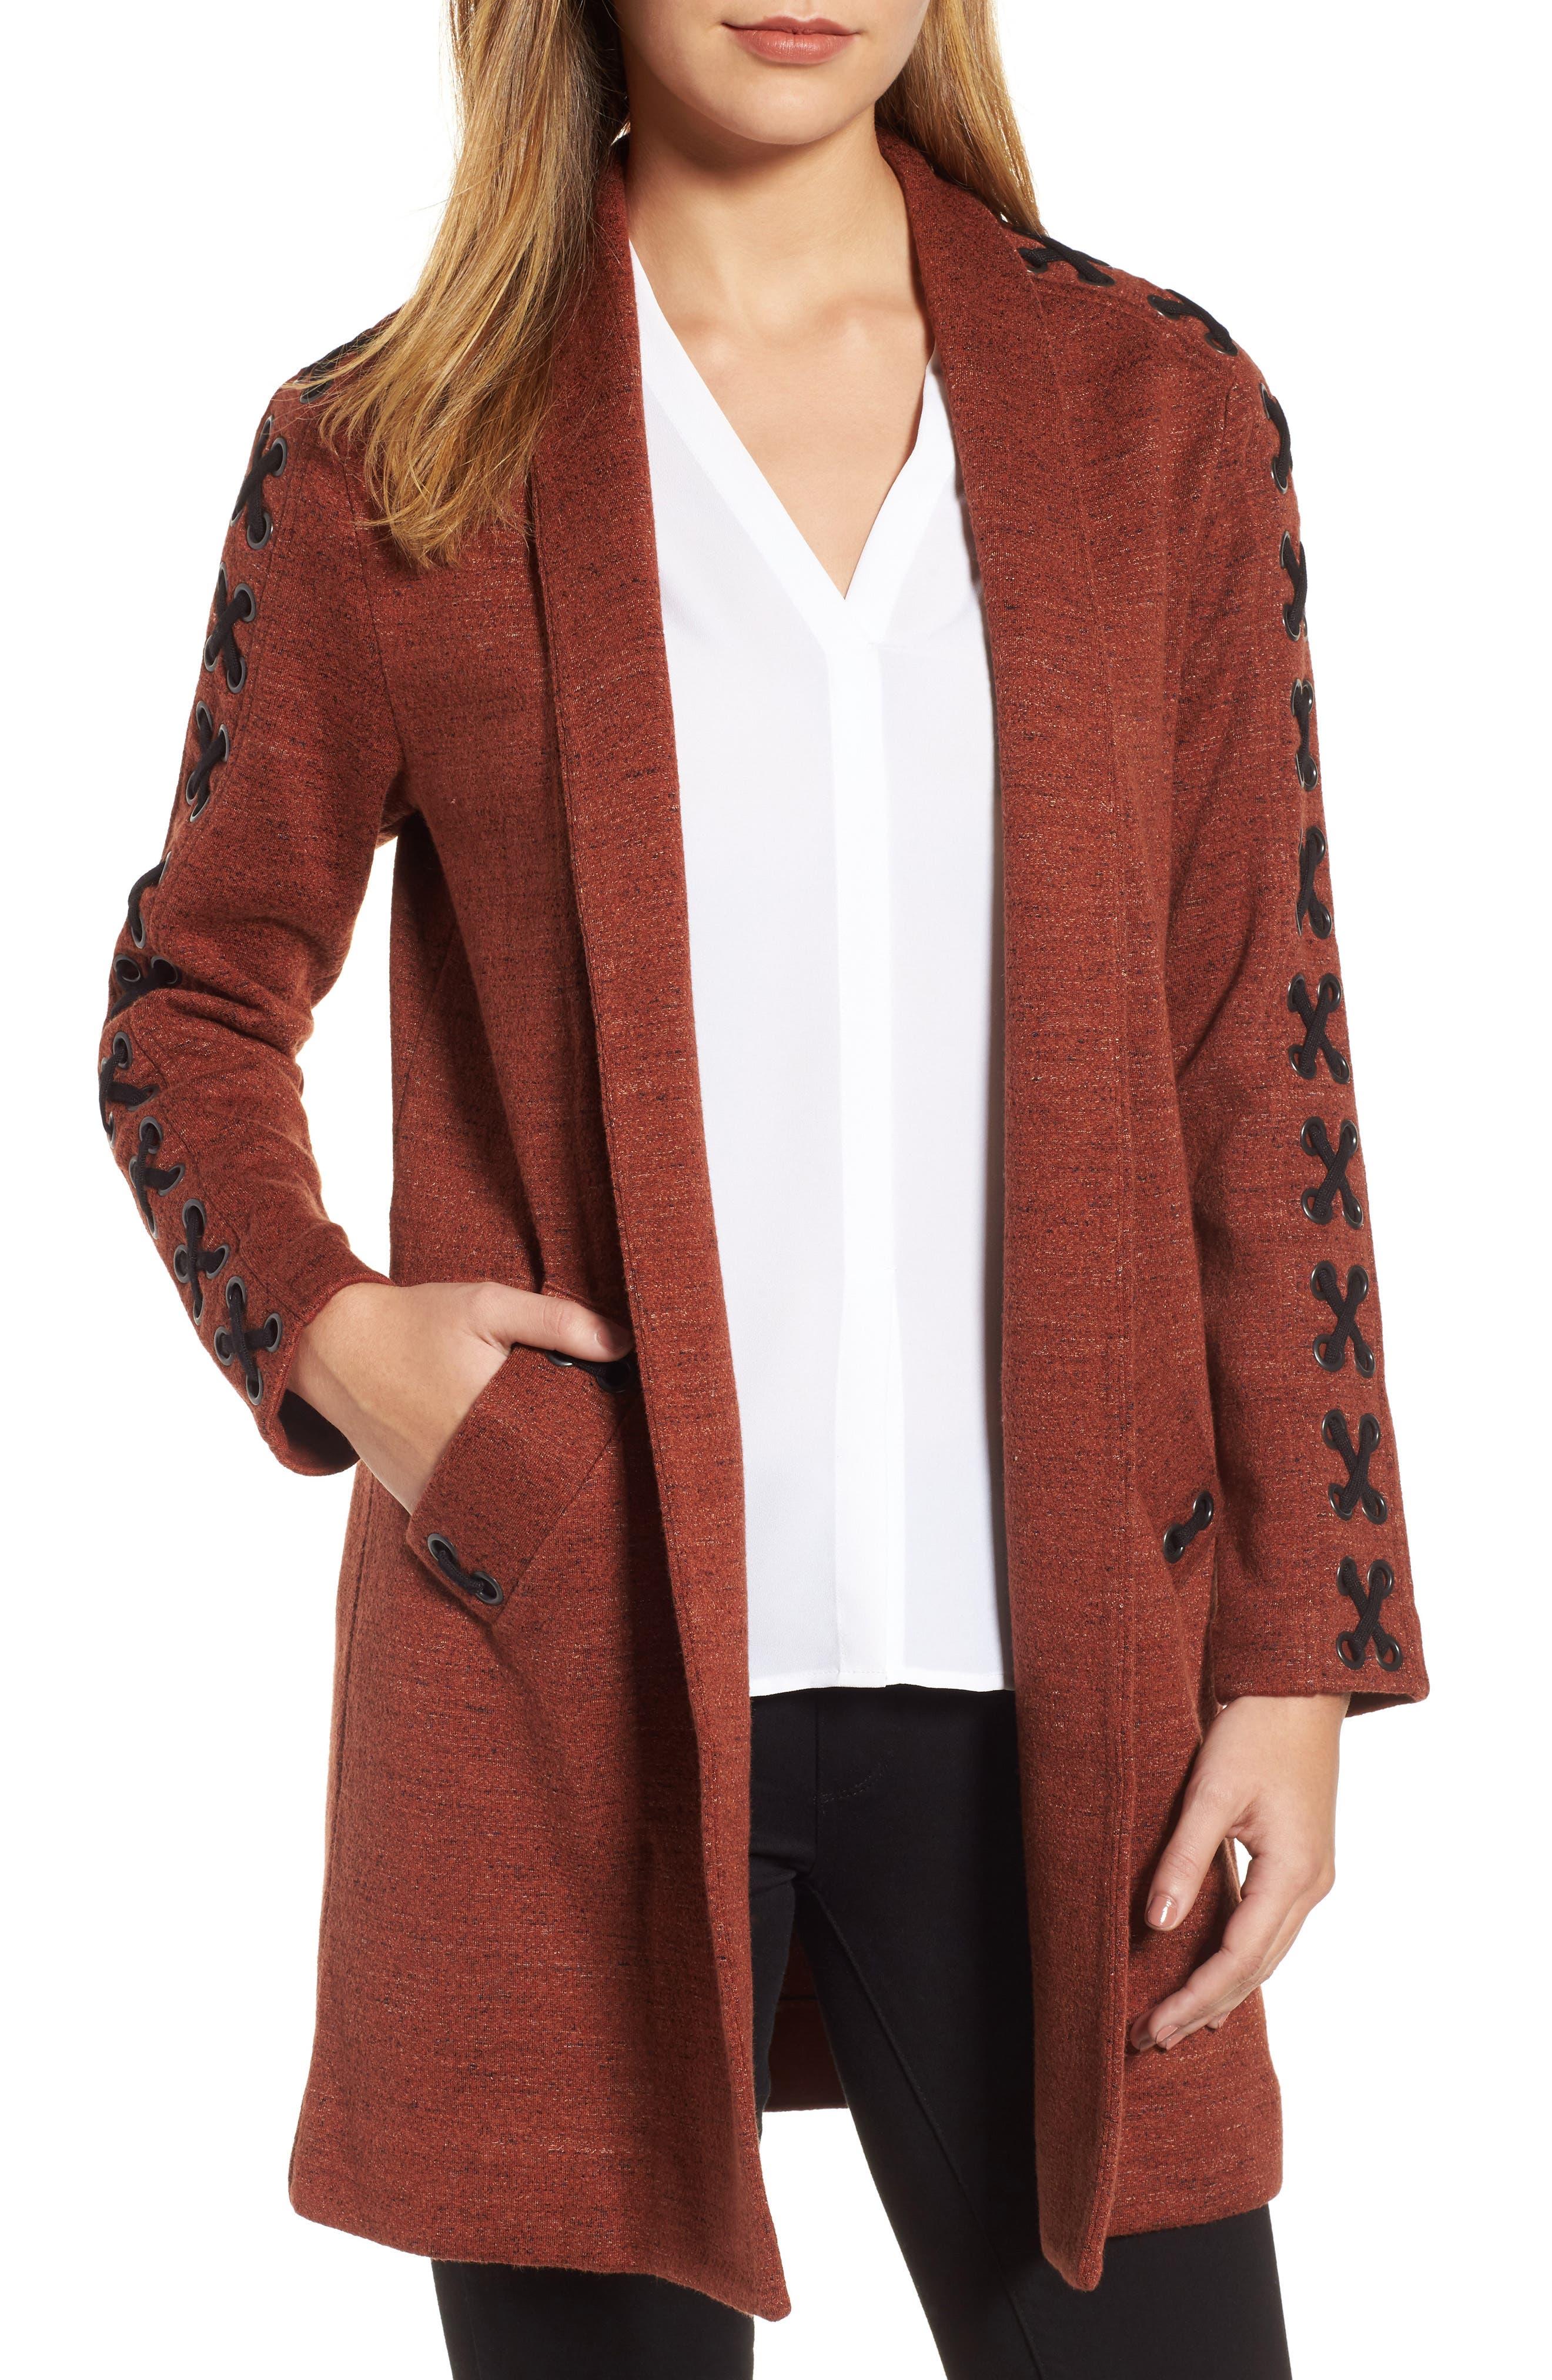 Alternate Image 1 Selected - NIC+ZOE Crisscross Detail Knit Jacket (Regular & Petite)